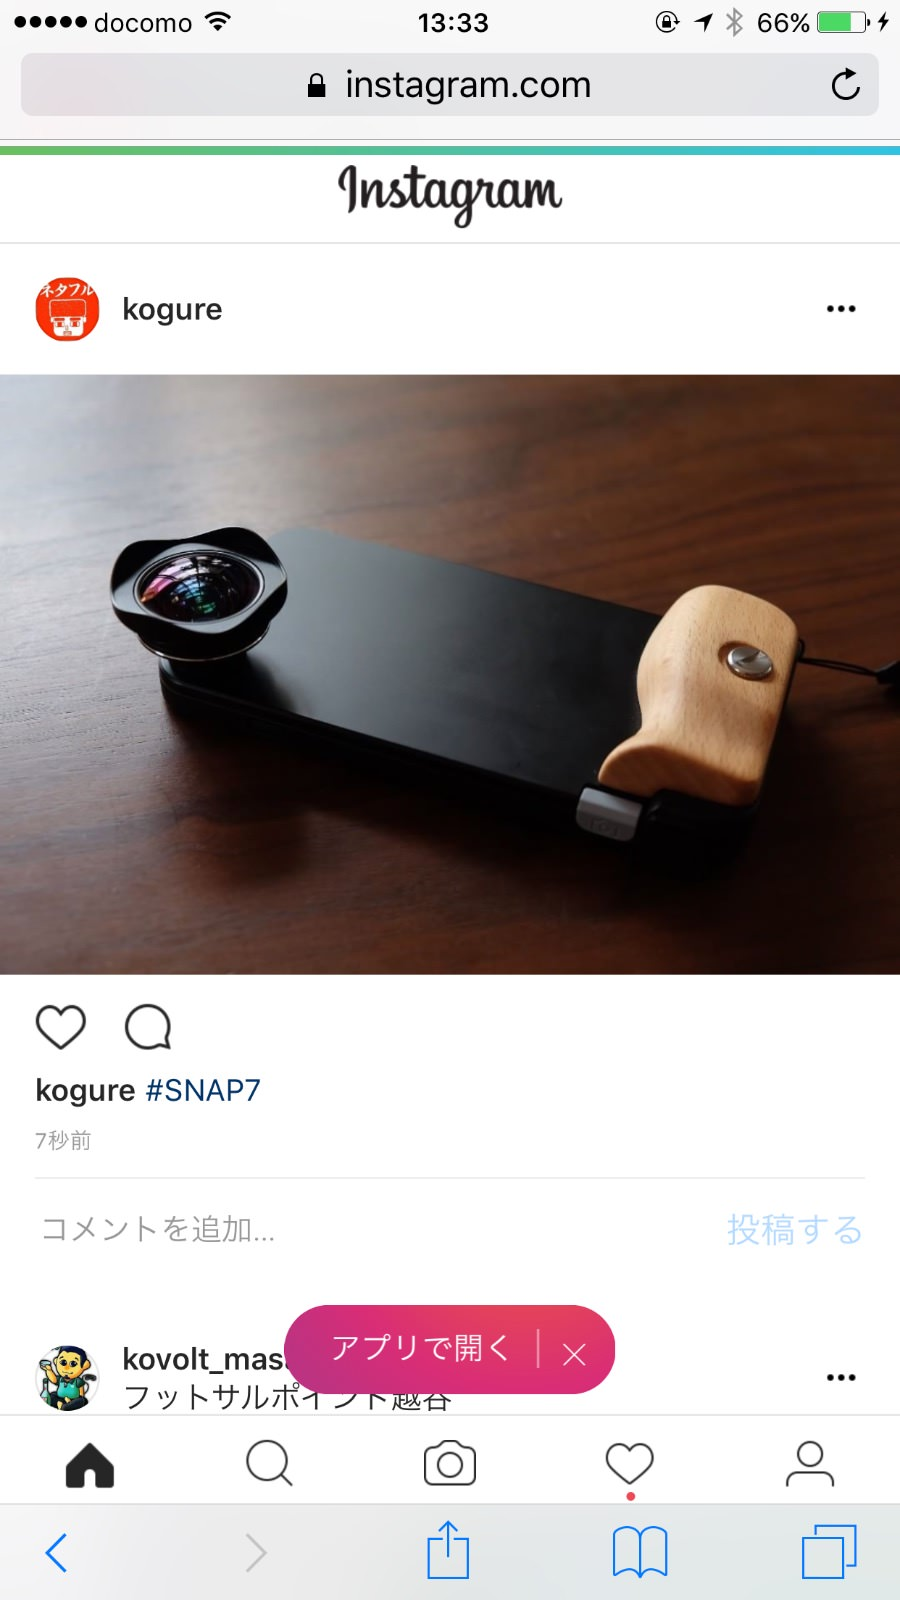 「Instagram」スマホのウェブブラウザーから投稿可能に 〜投稿方法を解説